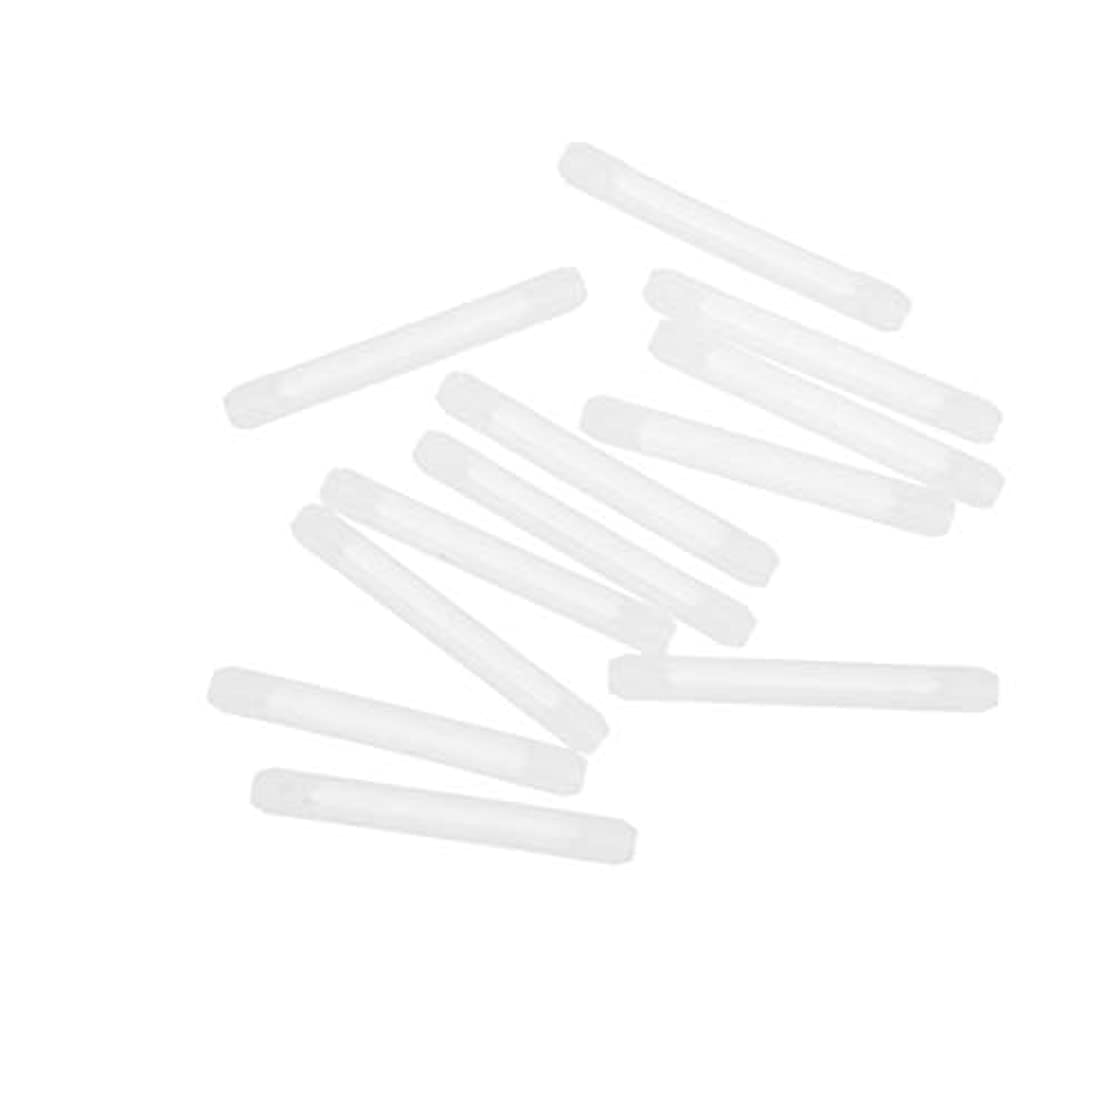 Healifty メガネホルダー滑り止めシリコンメガネアクセサリー20pcs(ホワイト)